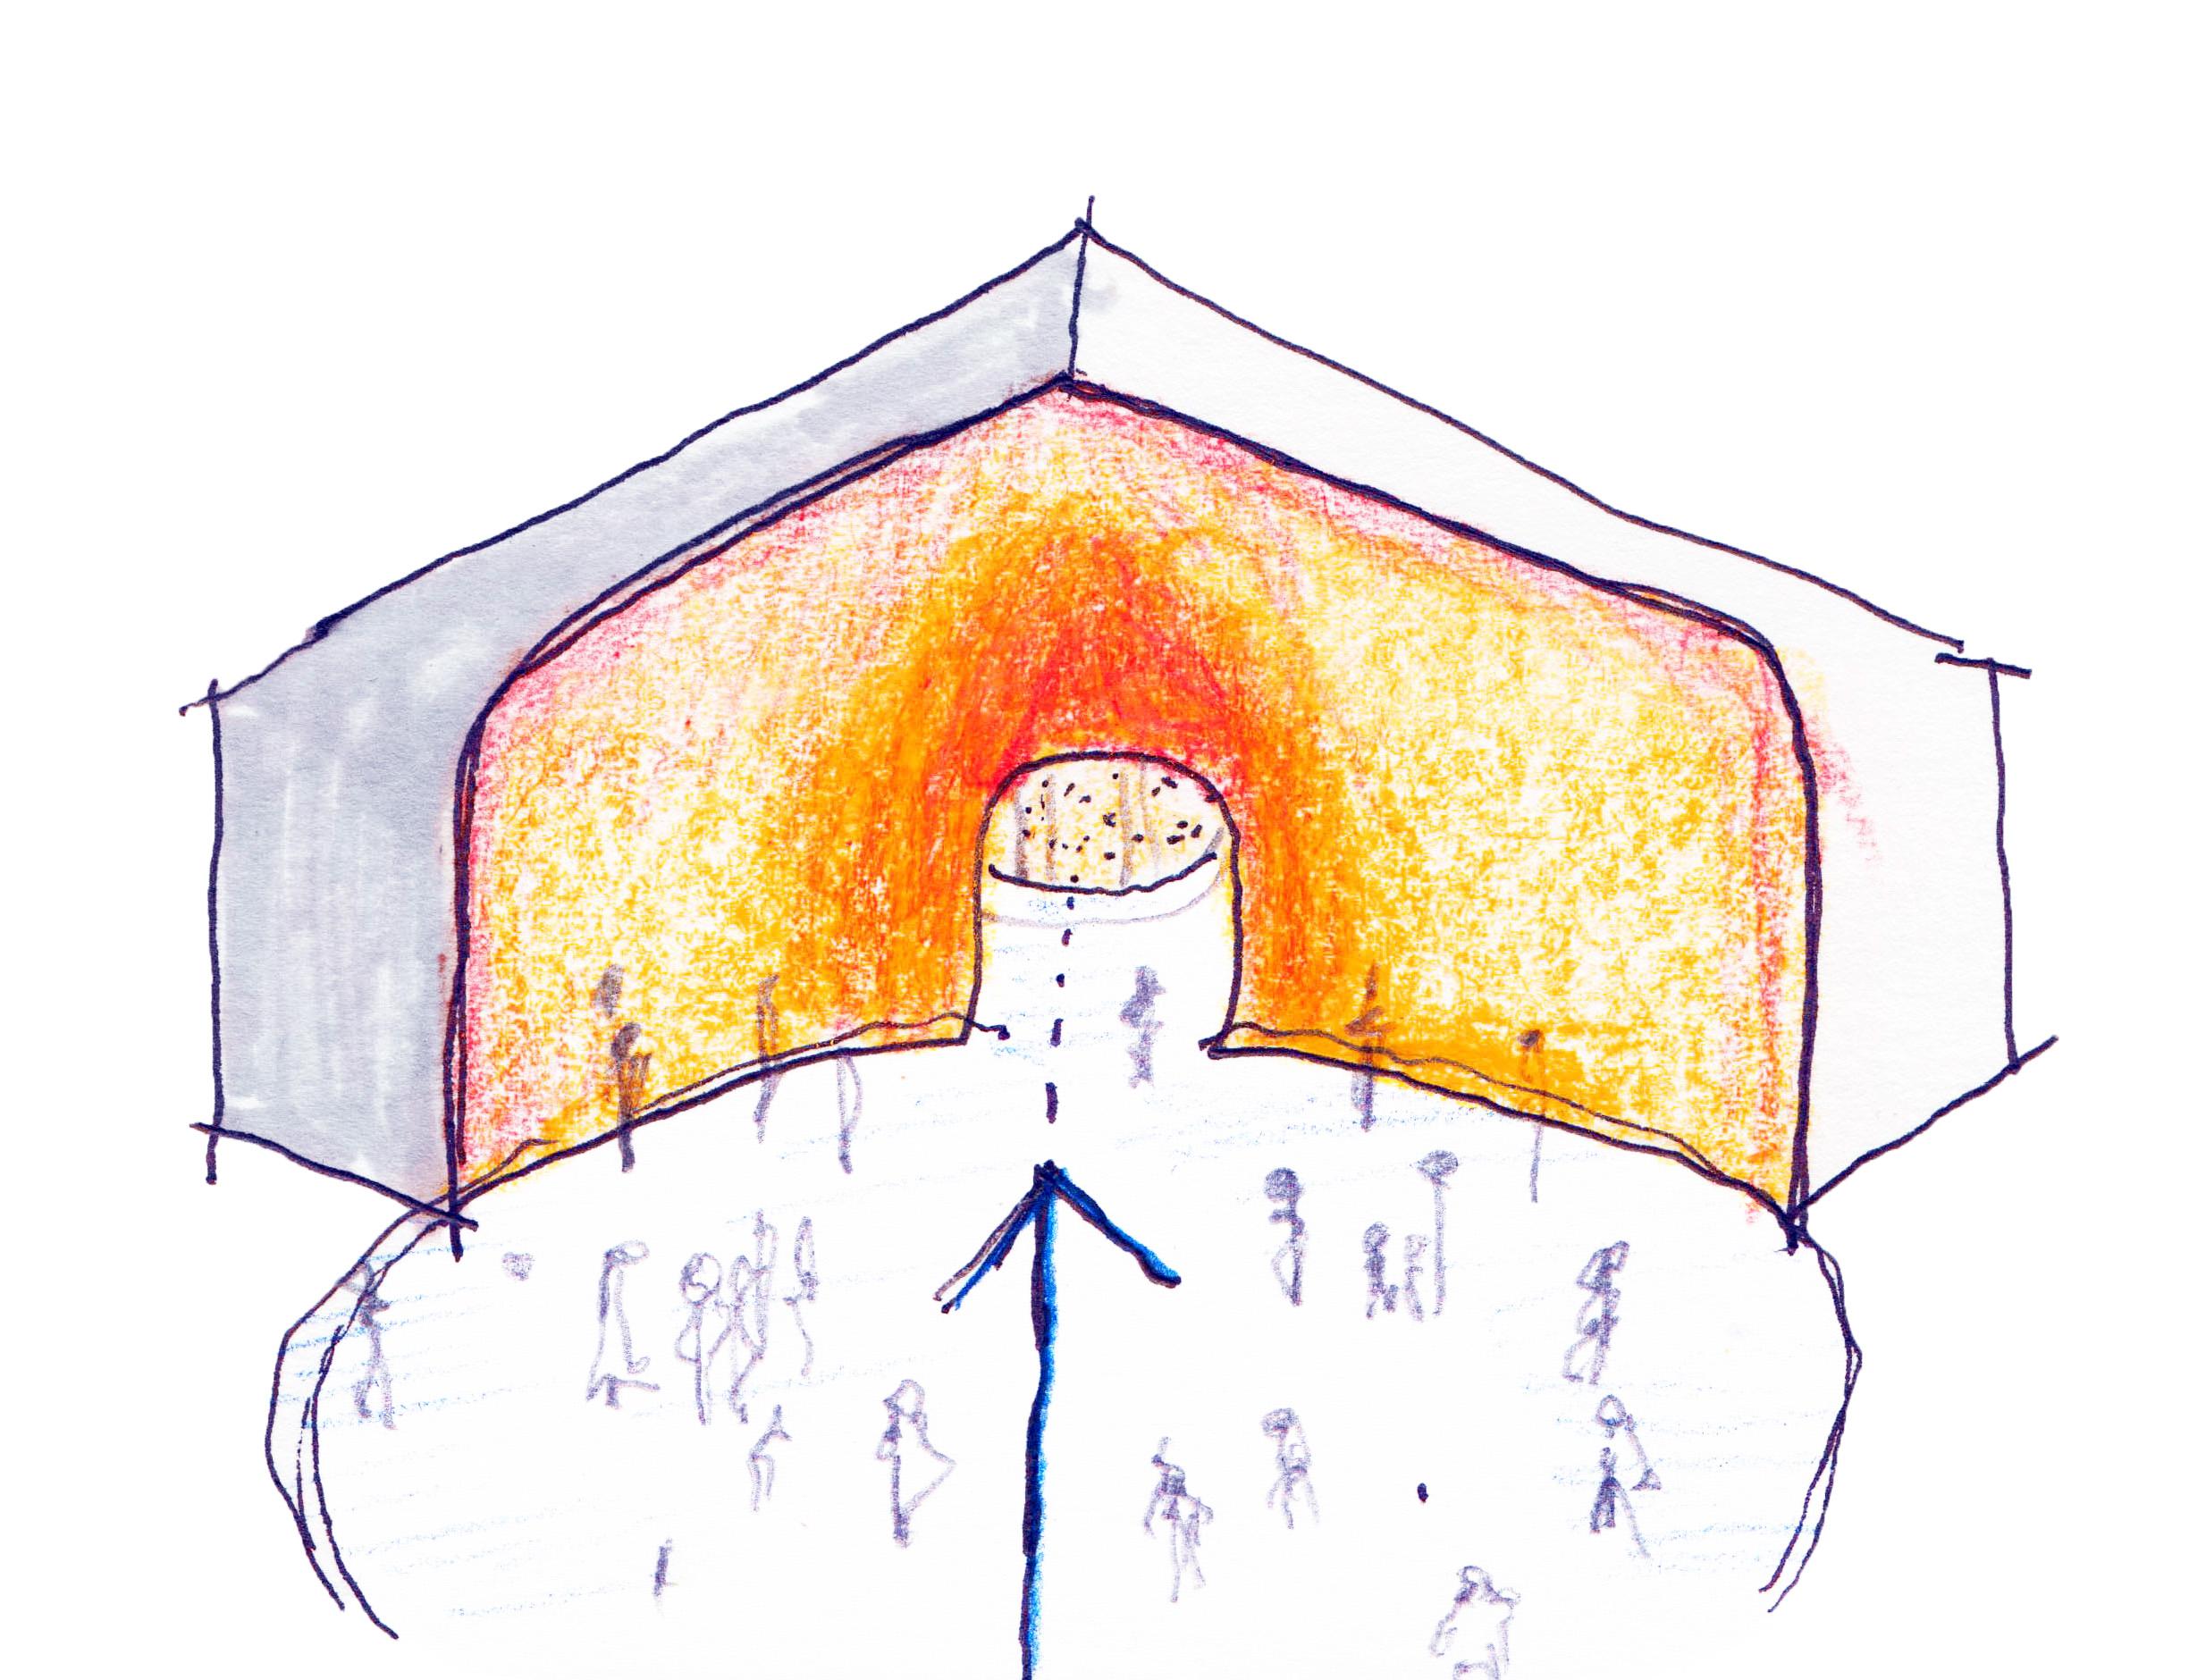 DameronArchitecture_SikhTempleWisconsin_8.jpg